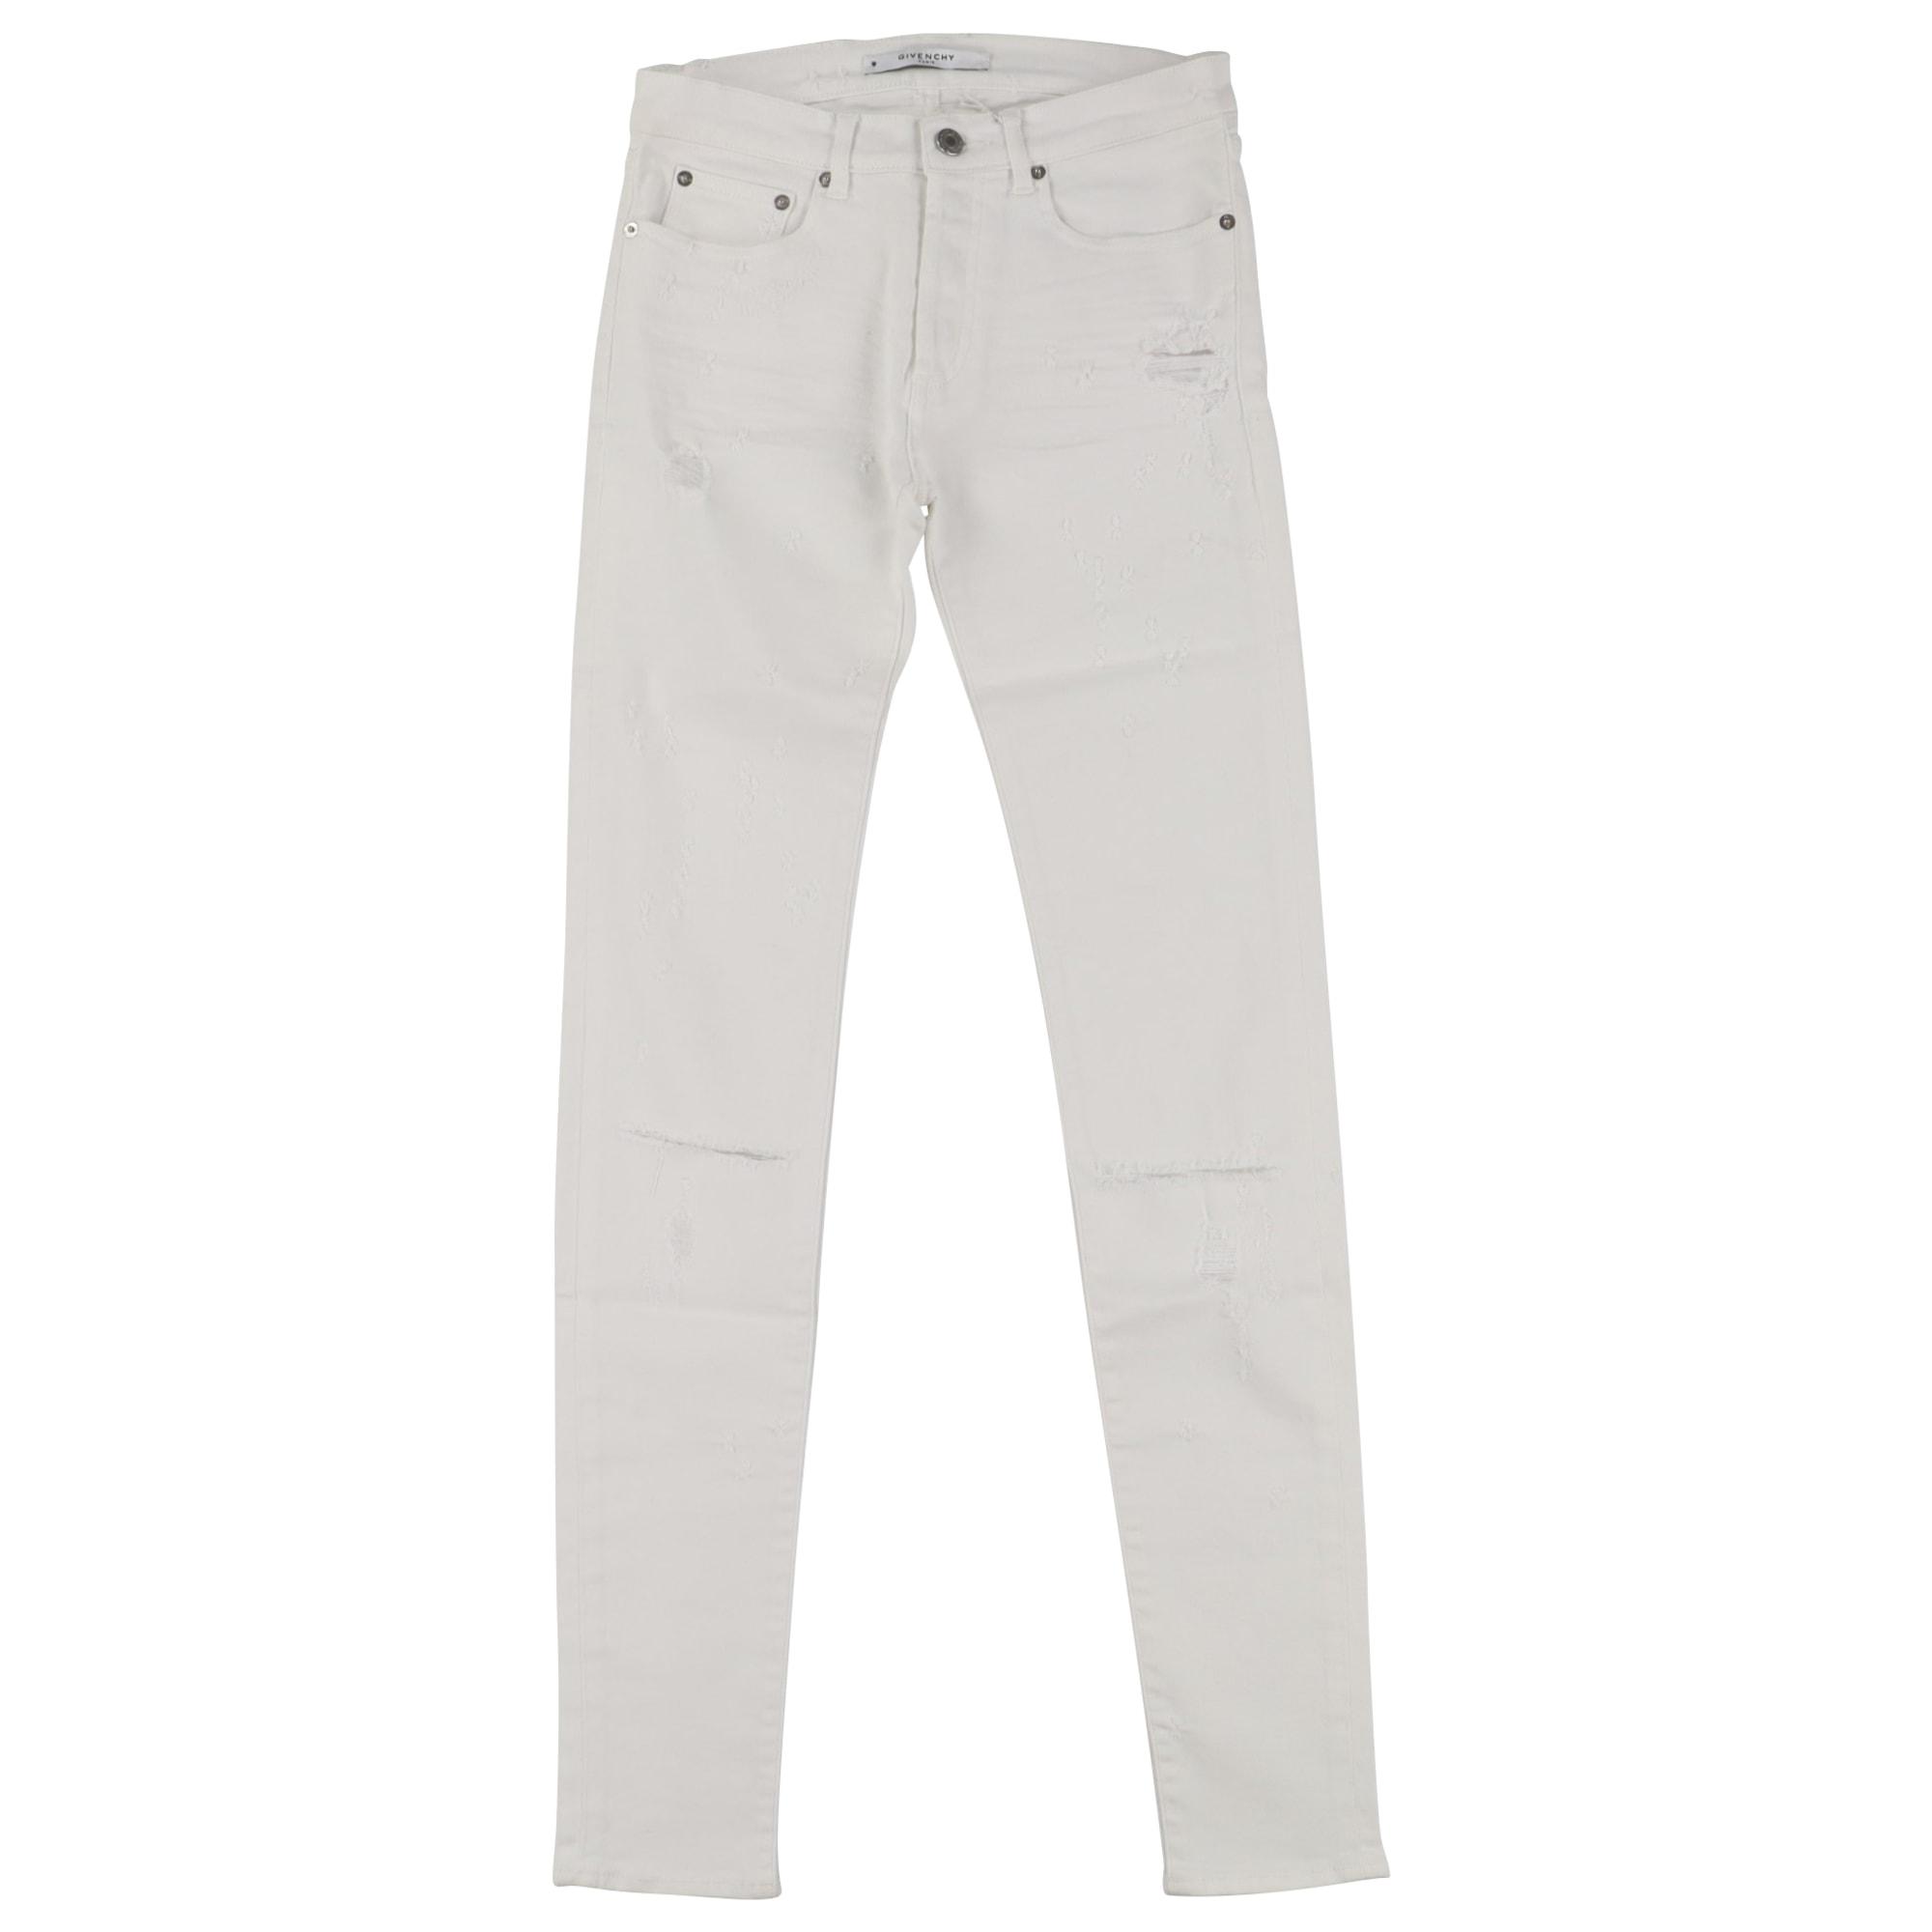 Jeans slim GIVENCHY Blanc, blanc cassé, écru